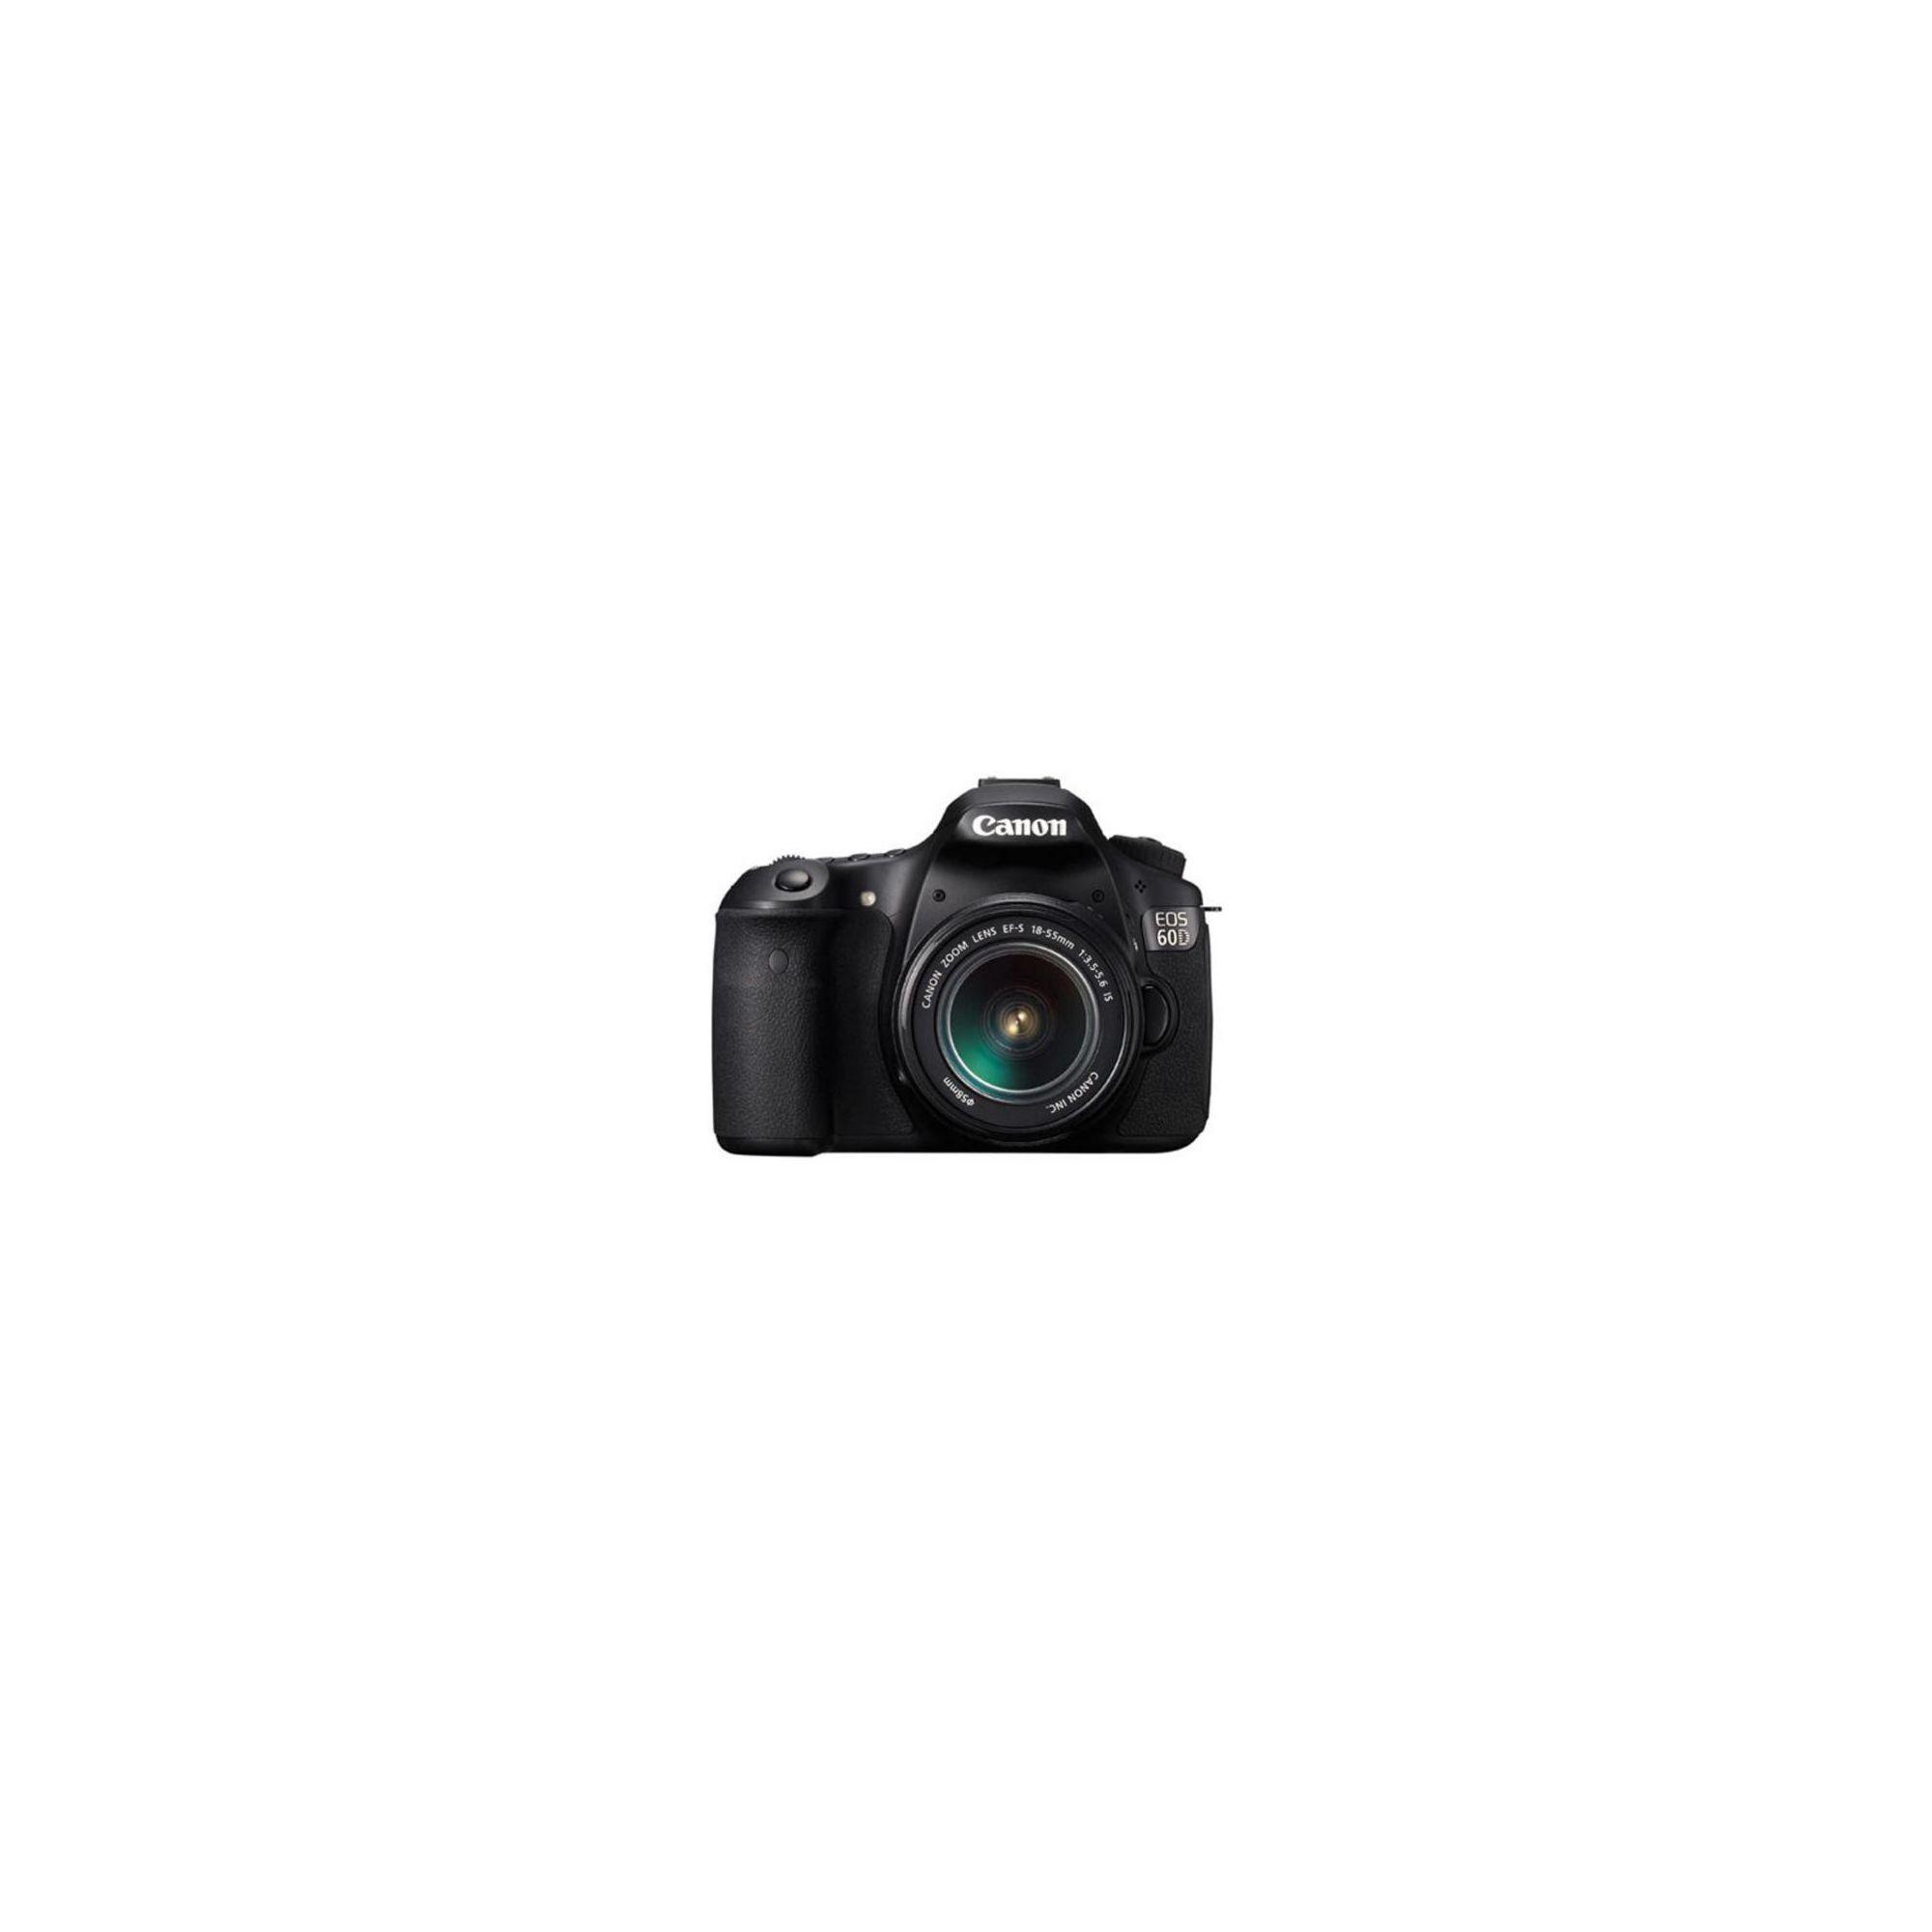 Canon EOS 60D Digital SLR Camera (Inc EF-S 17-85 mm f/4-5.6 IS USM Lens Kit)